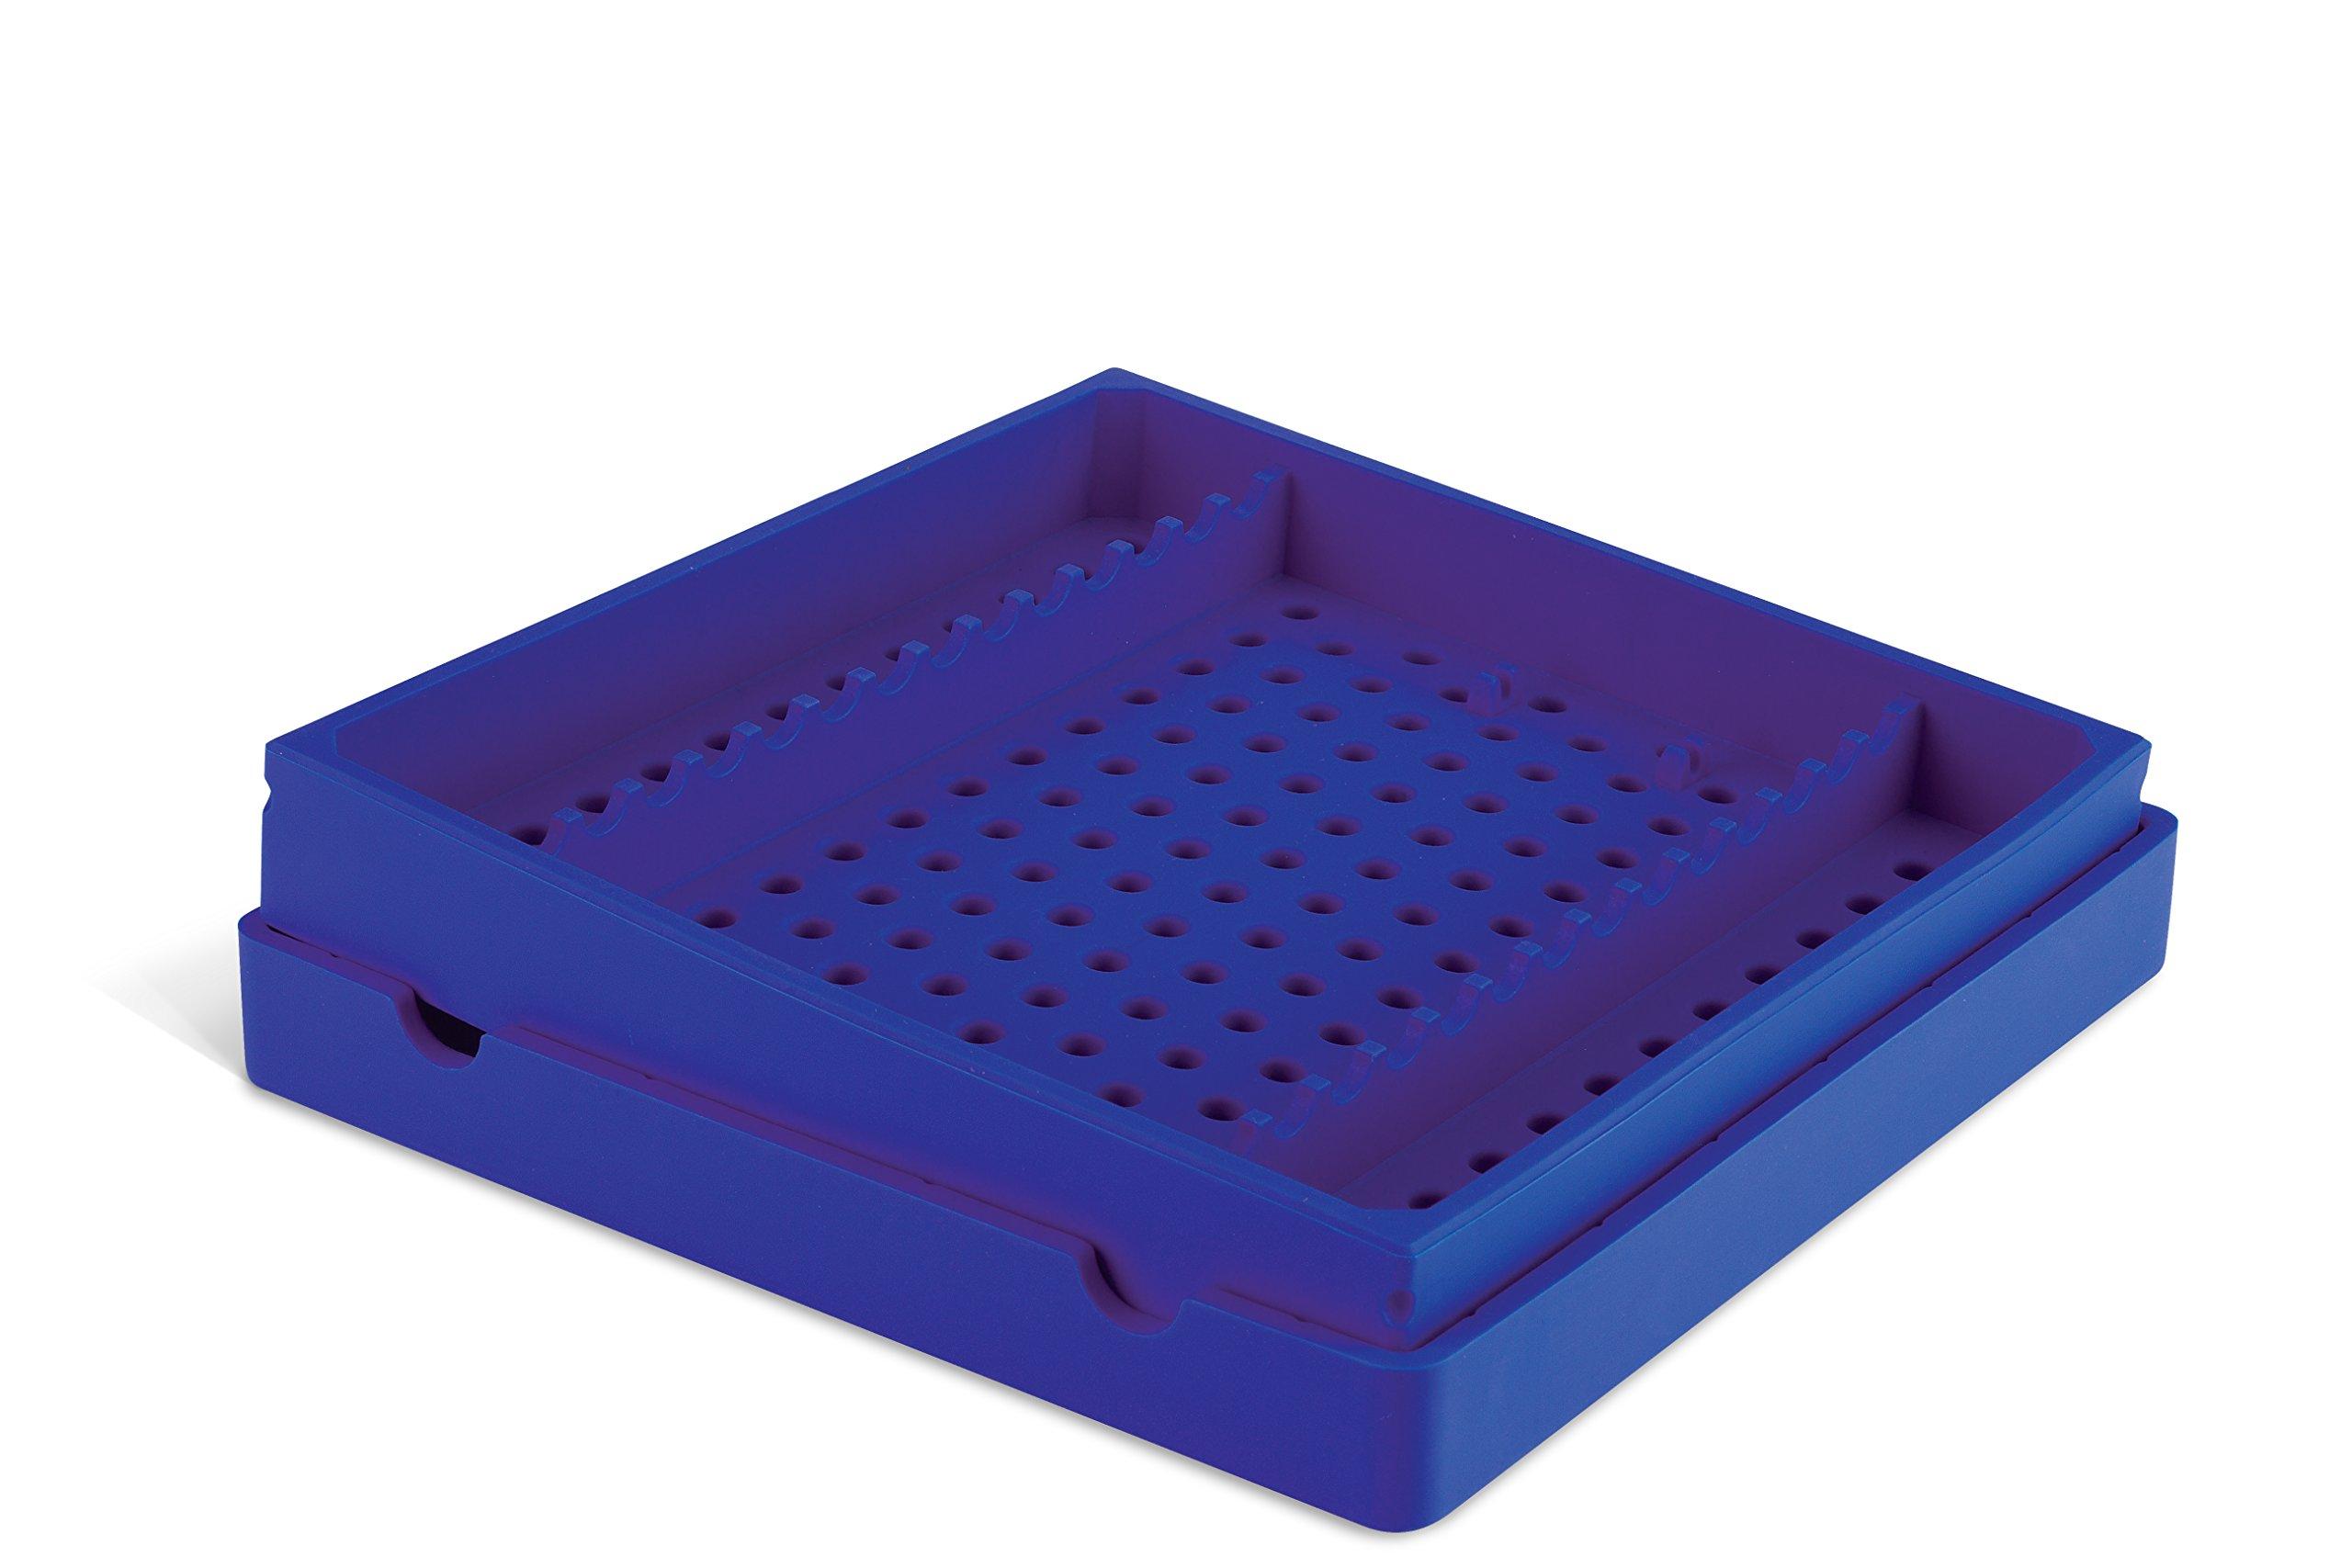 Practicon 7039772 PUR Cool Cassette 14 Instrument Container, Purple